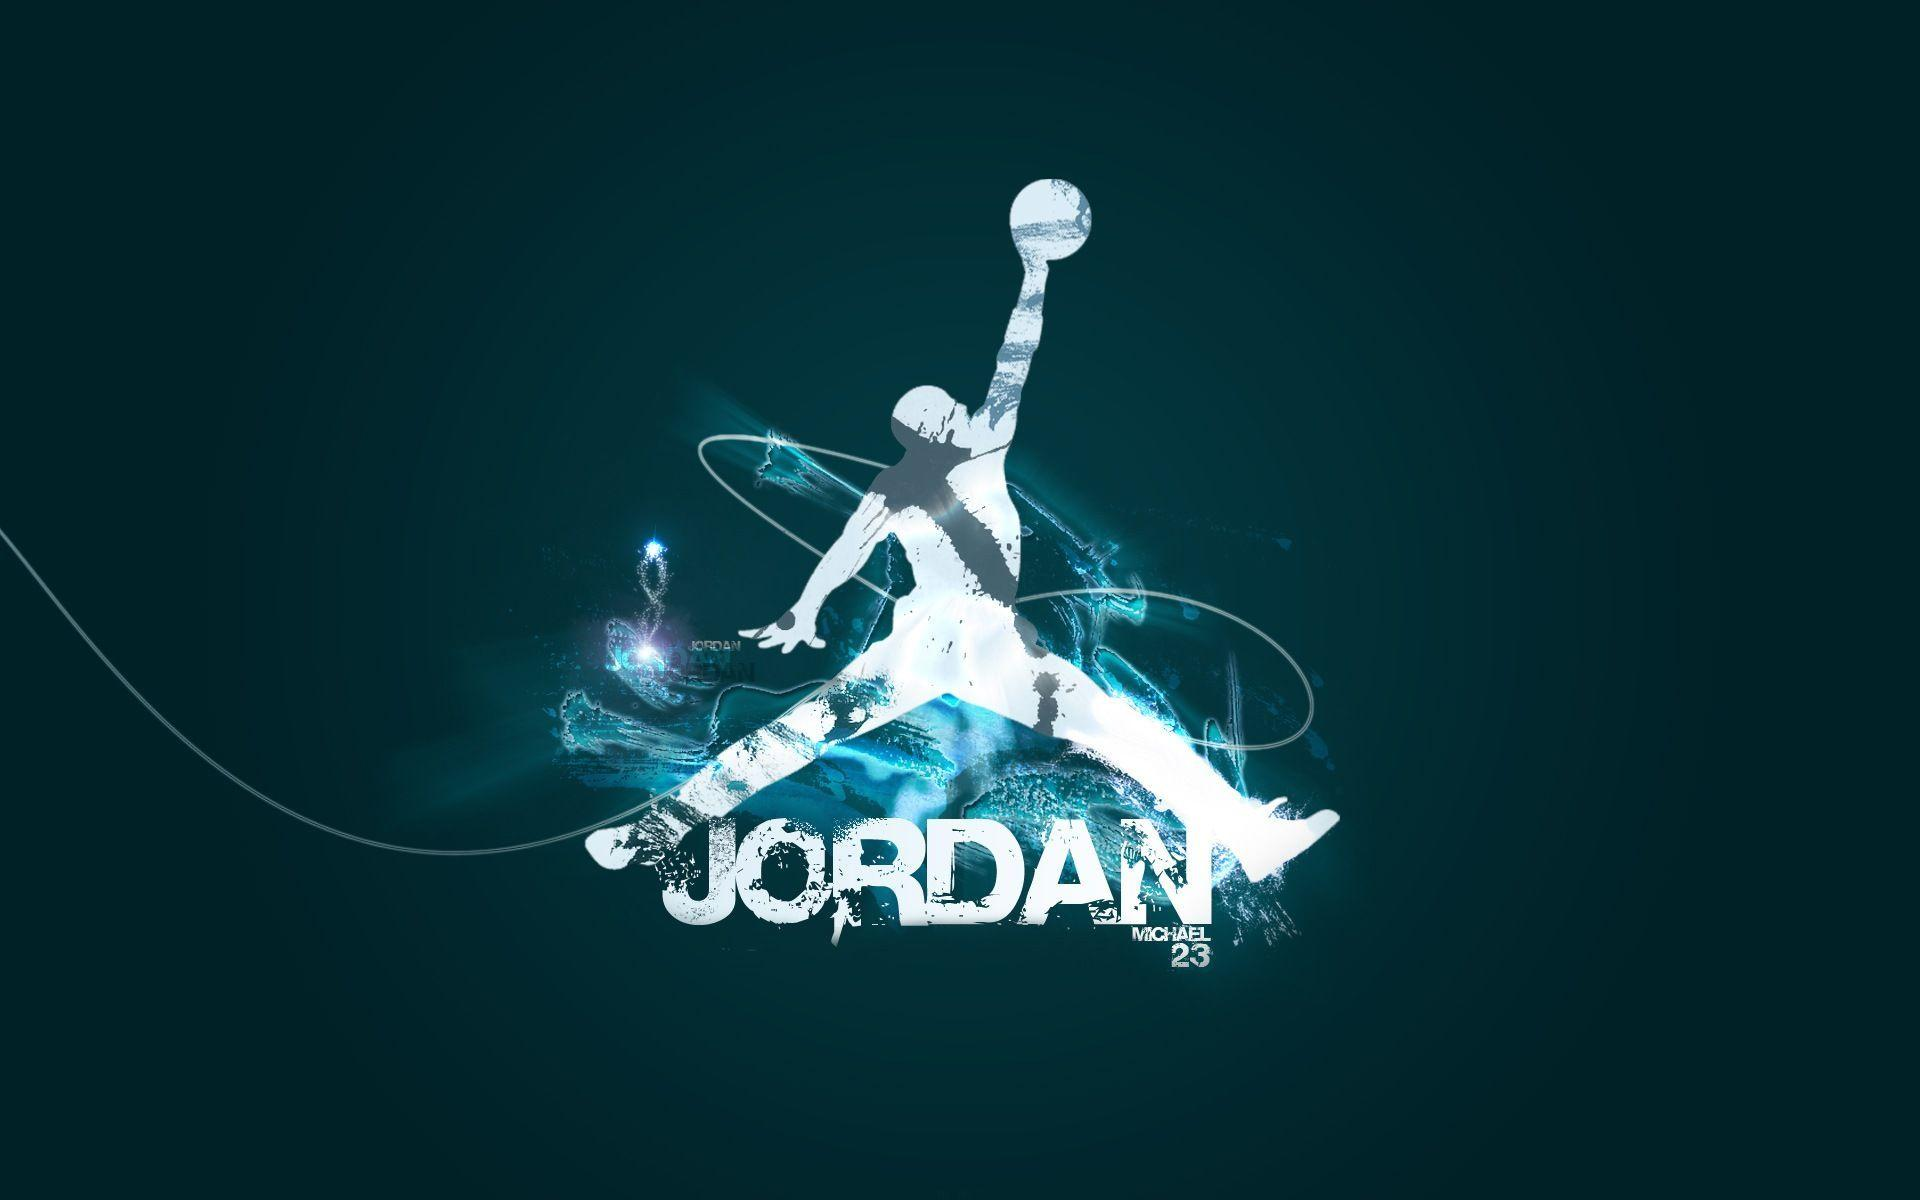 1920x1200 Air Jordan hình nền